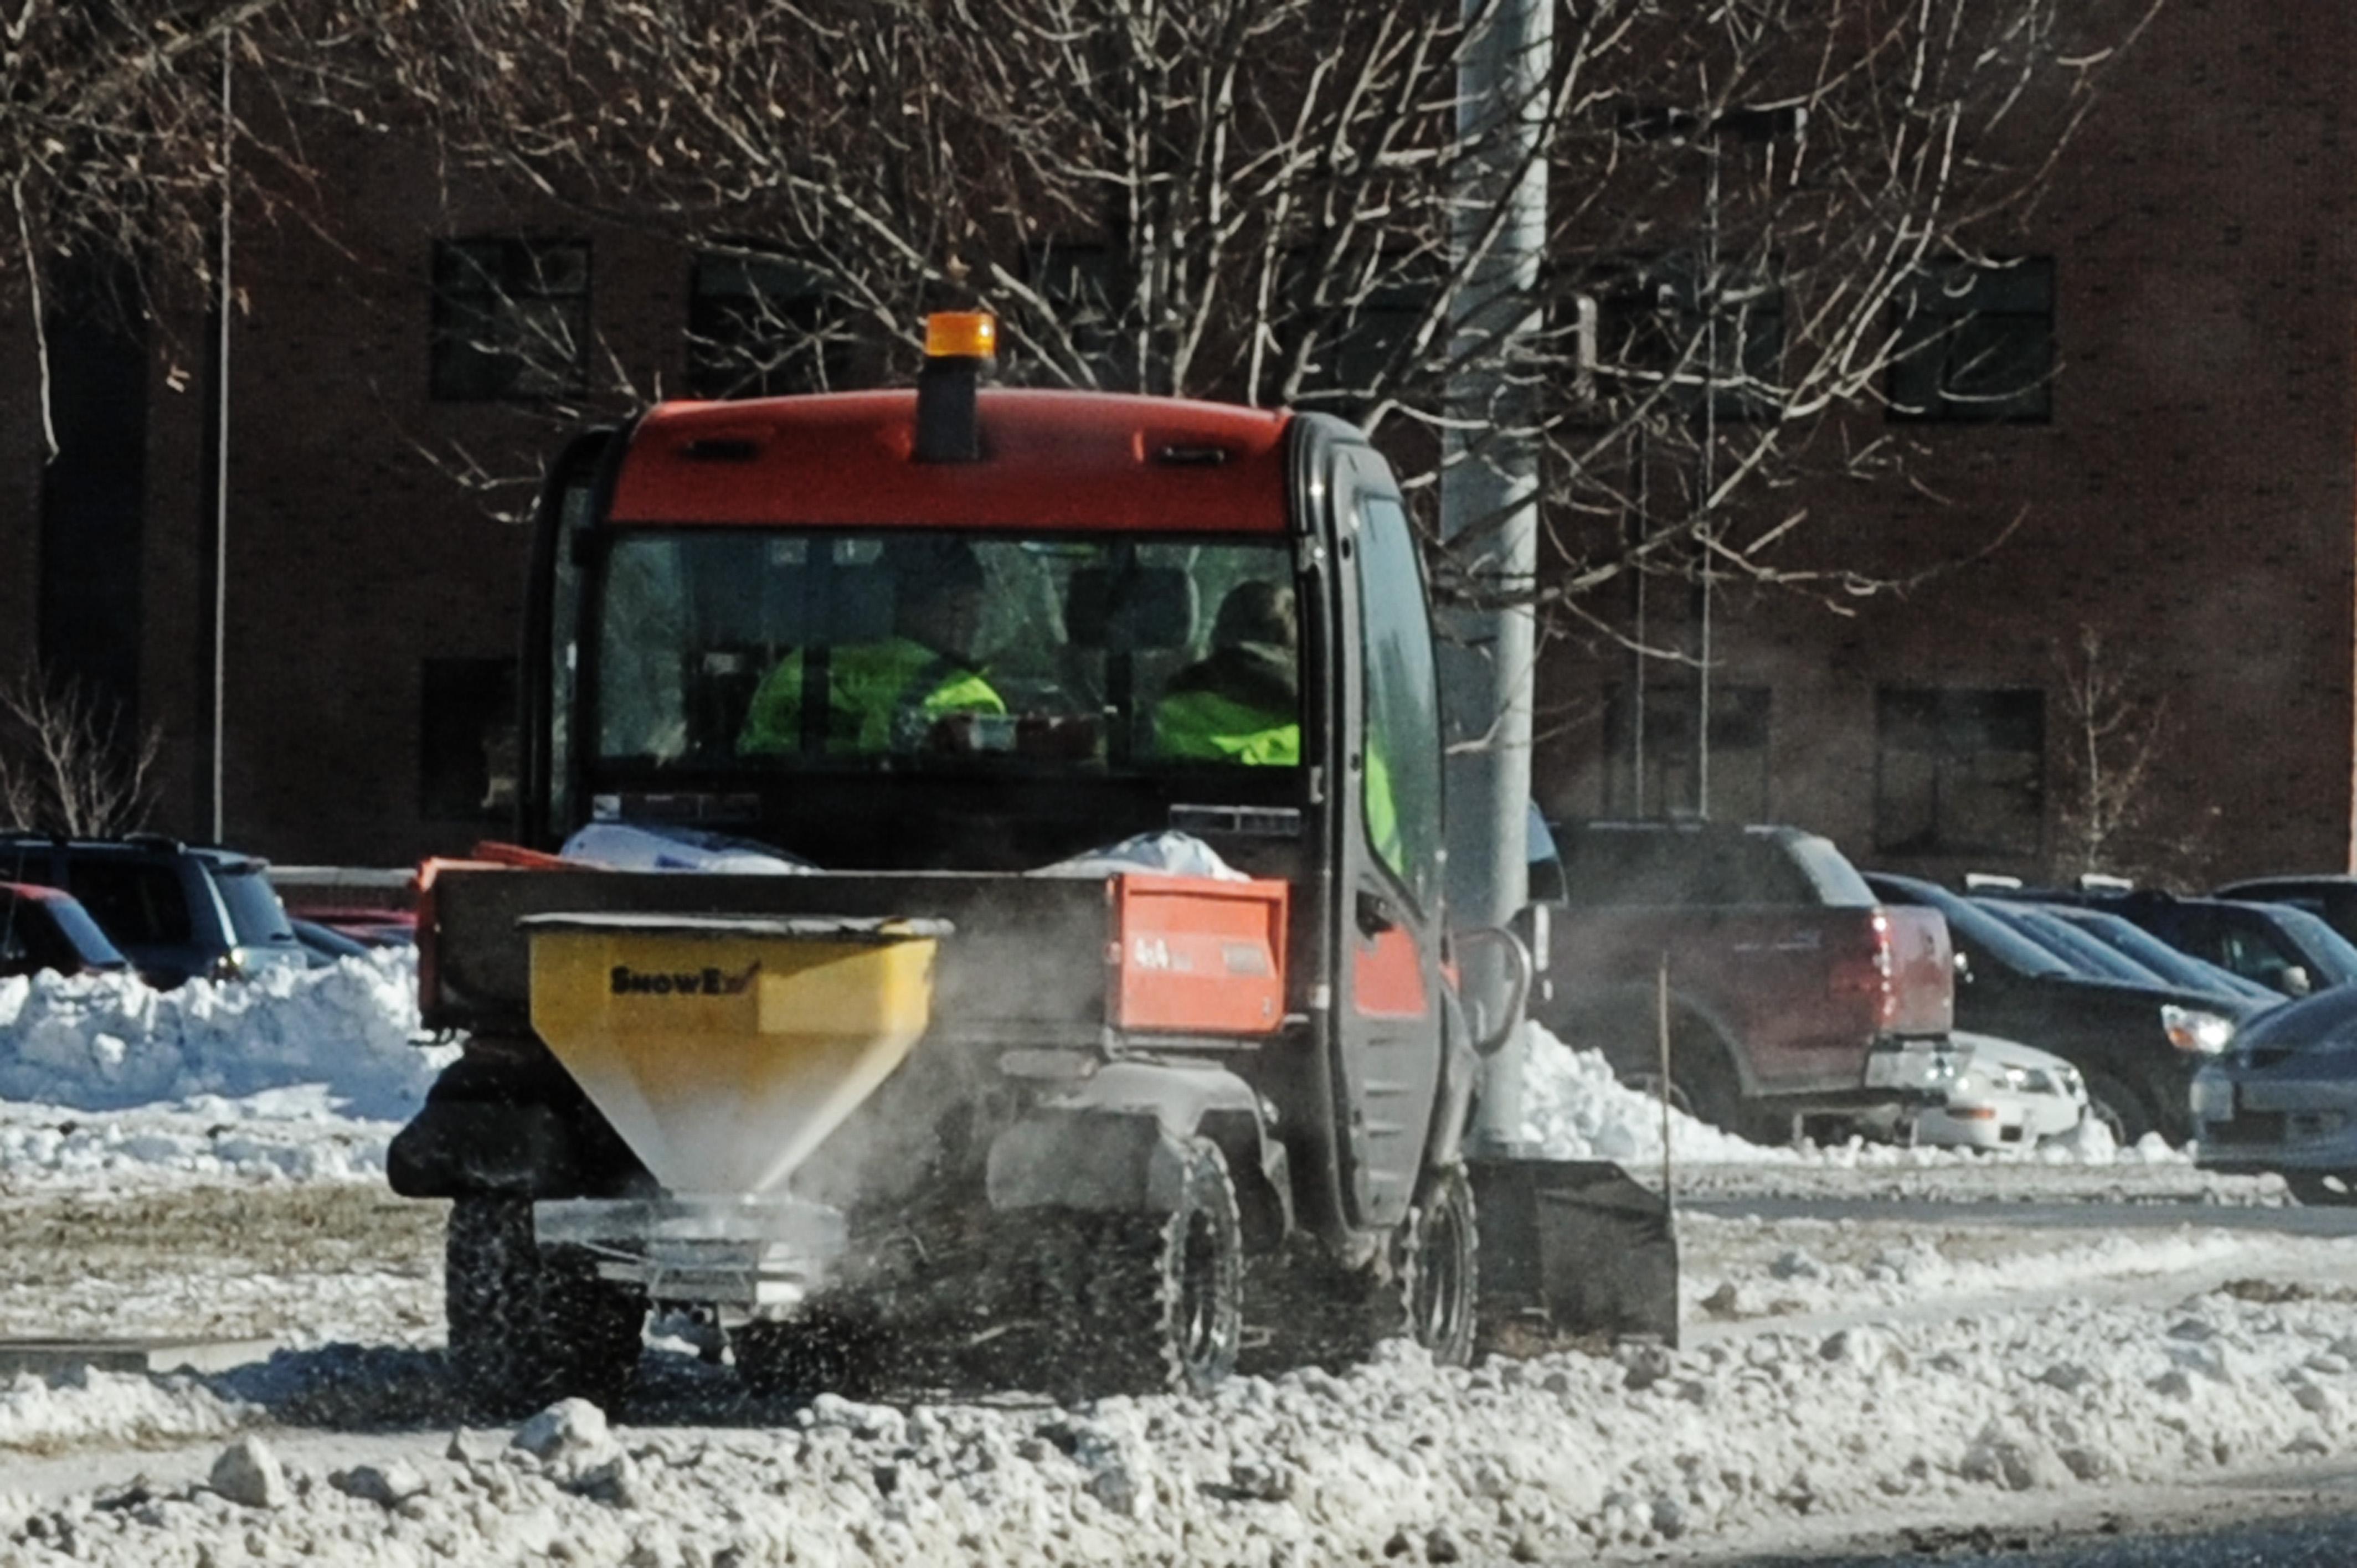 Scott Receives First Snow Fall Of Winter Season